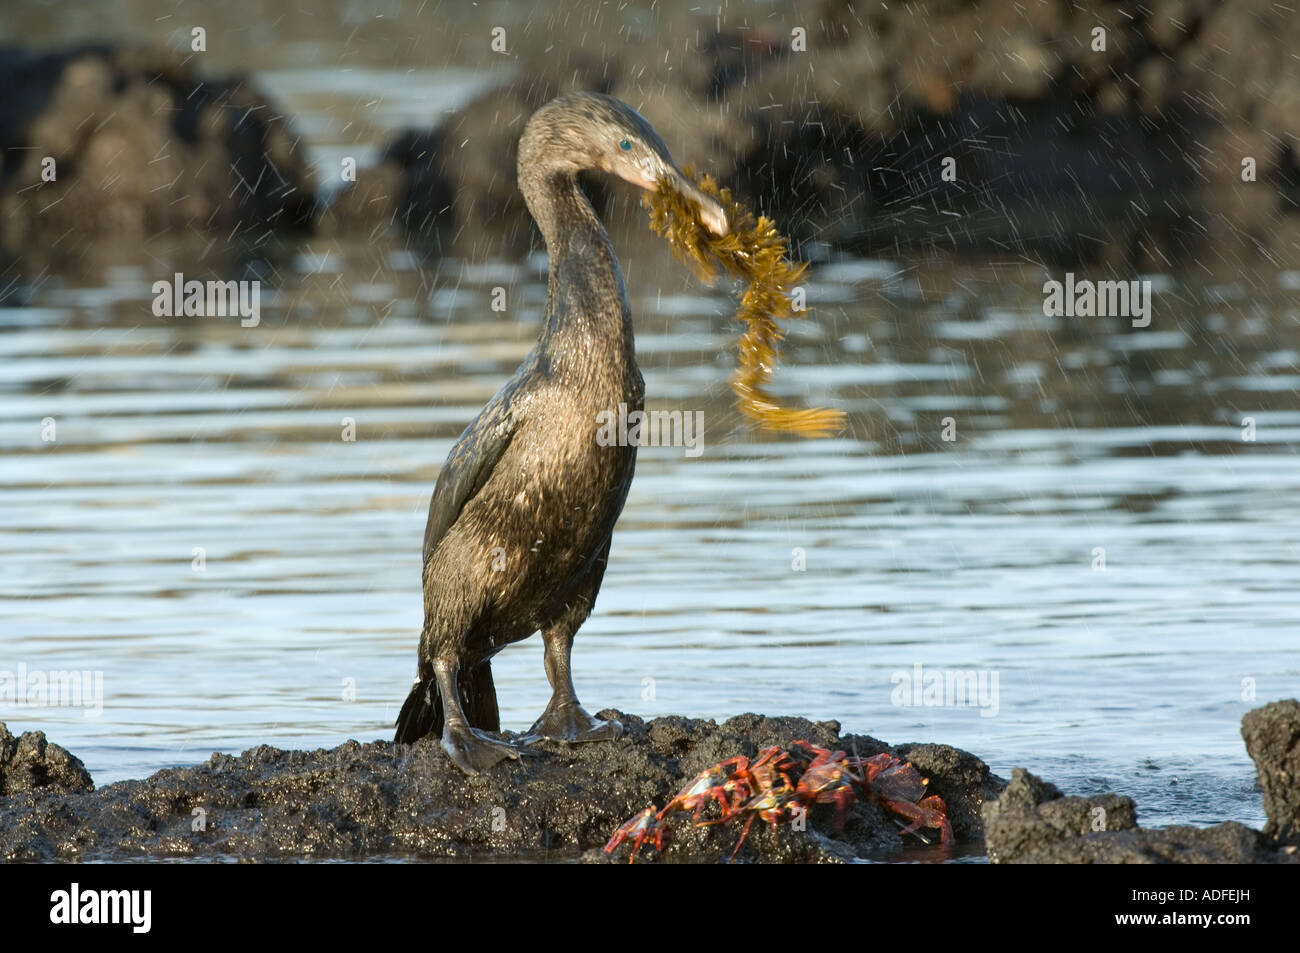 Flightless Cormorant (Nannopterum harrisi) male carrying seaweed, nest-building gifts, Punta AlbemarleIsabela Galapagos Stock Photo